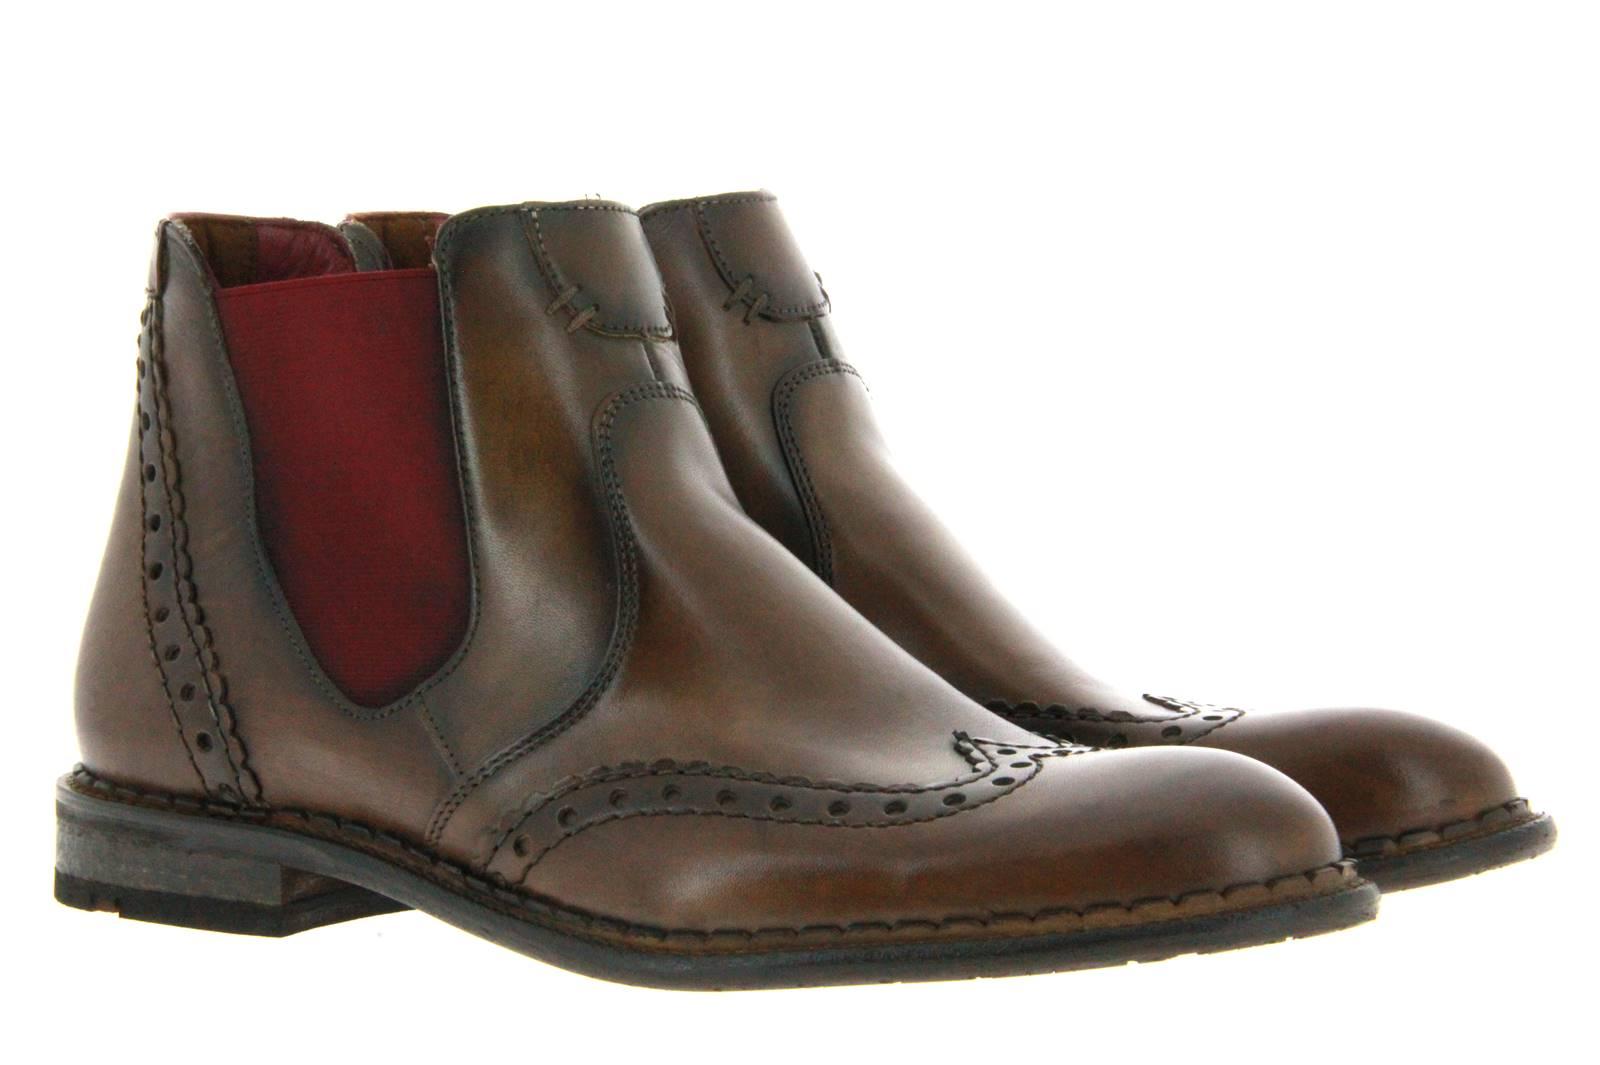 Lloyd boots GRENOBLE SPLENDOR CALF TOBACCO BORDO